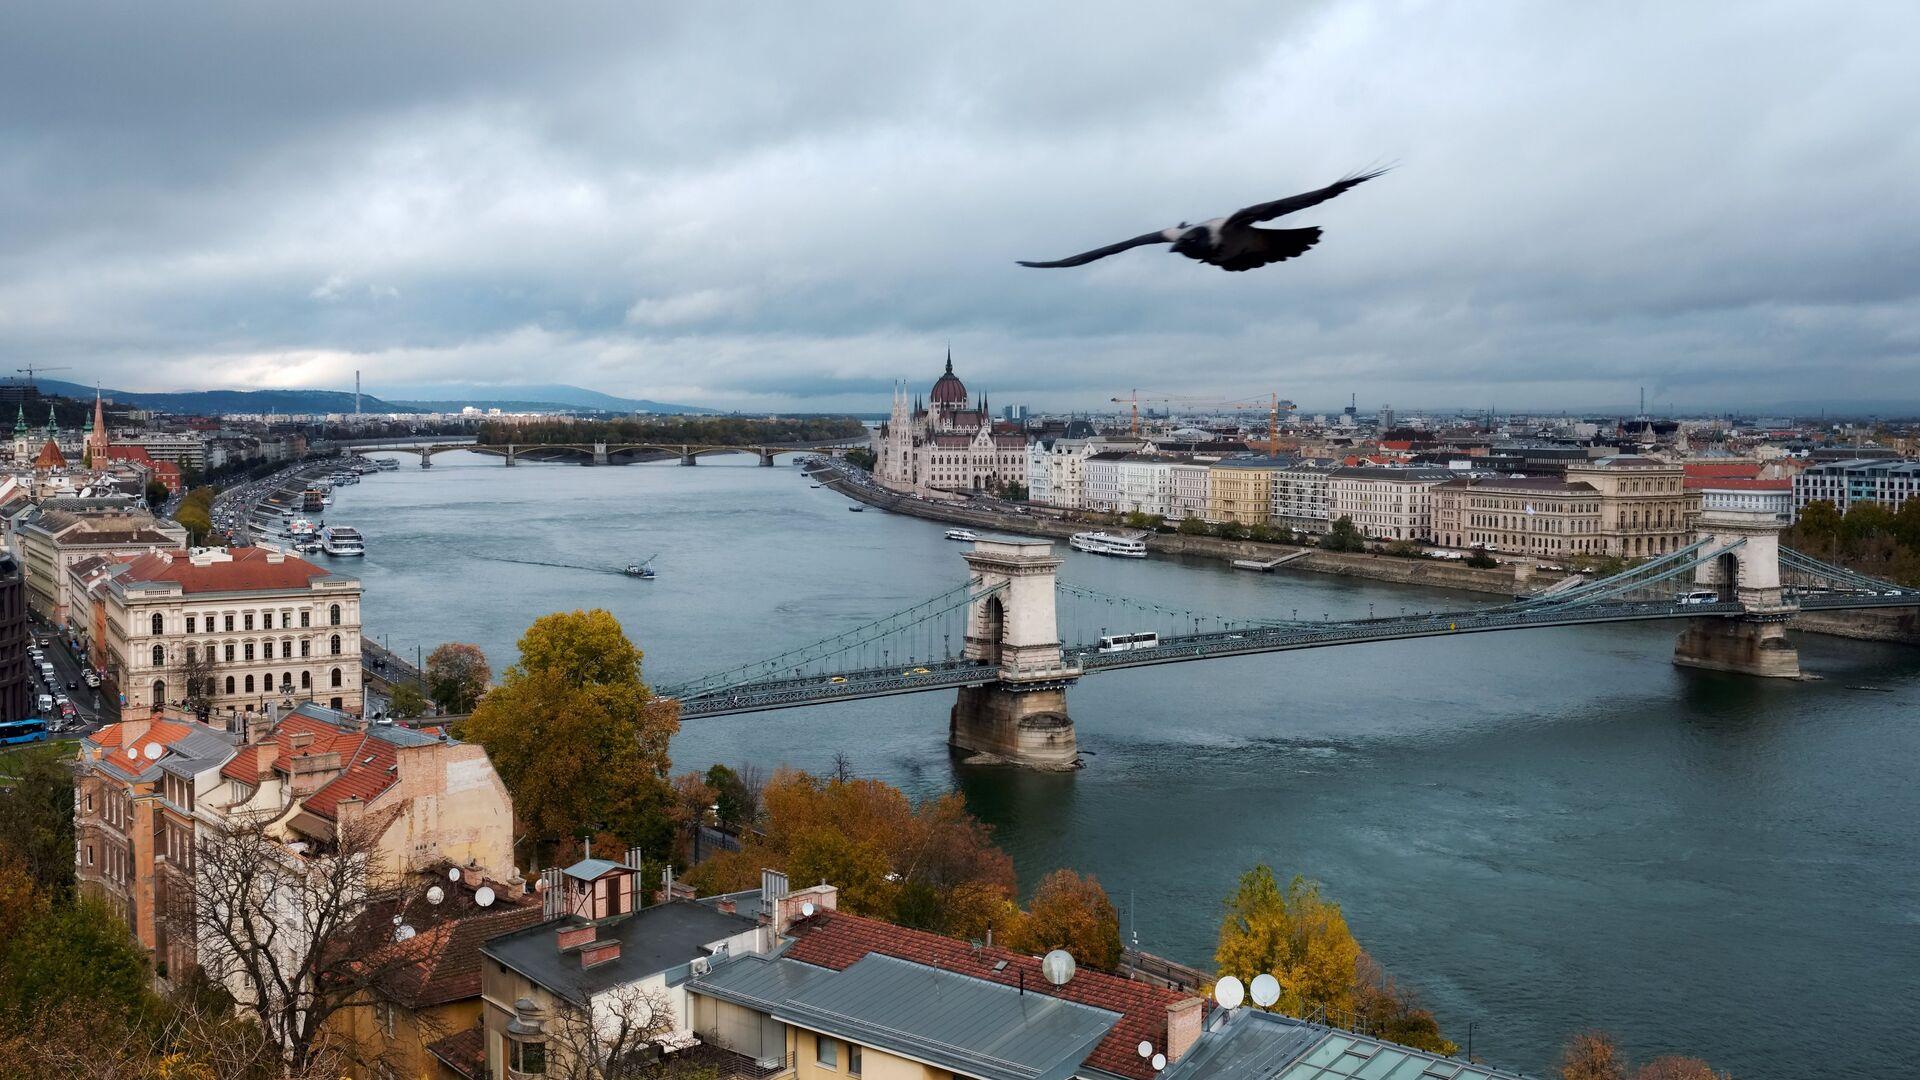 Река Дунай в Будапеште - РИА Новости, 1920, 28.09.2021